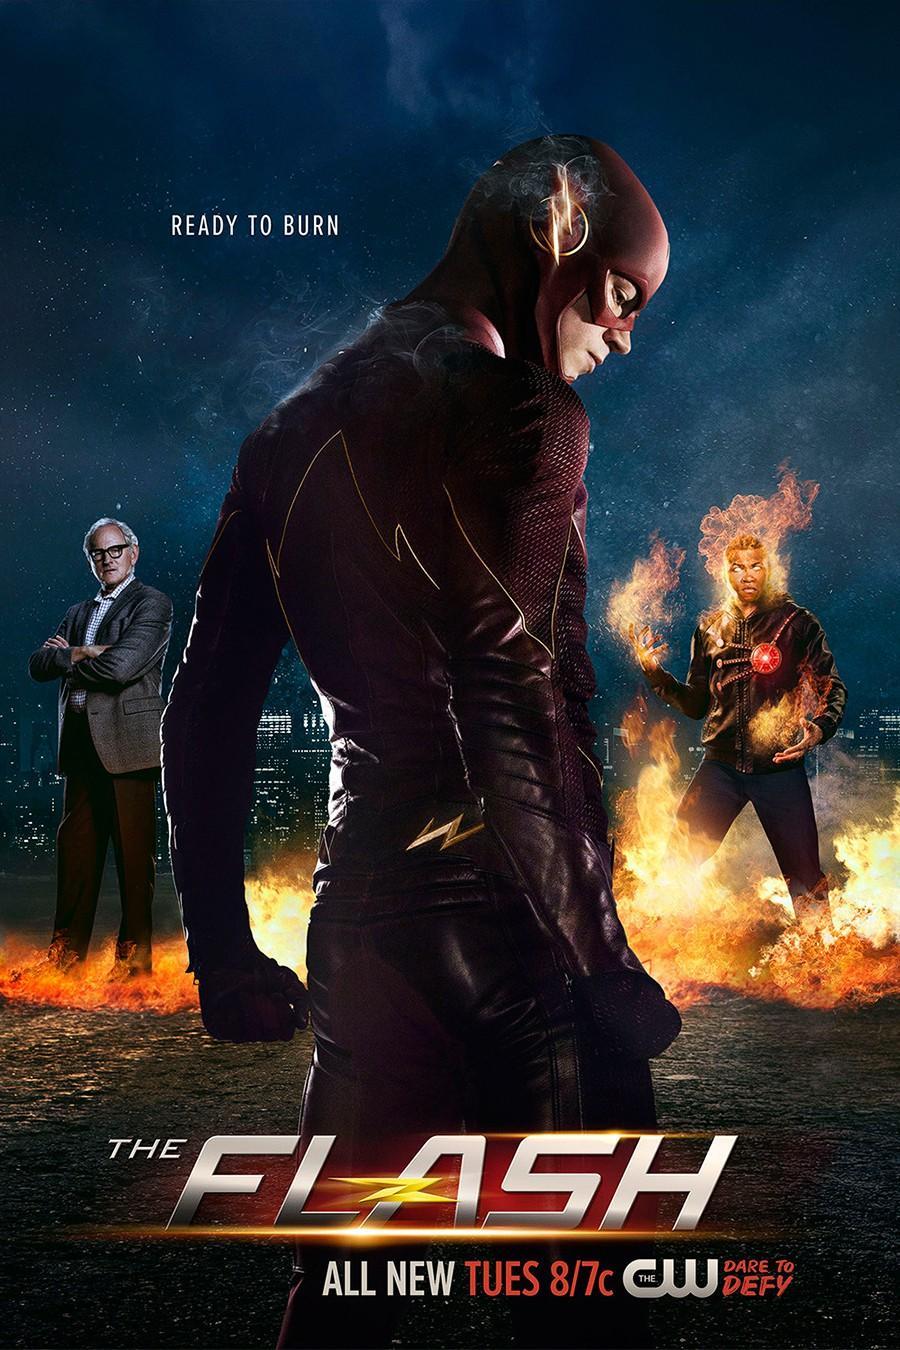 The%20Flash.9 1 دانلود سریال The Flash : قسمت آخر فصل ۴ اضافه شد